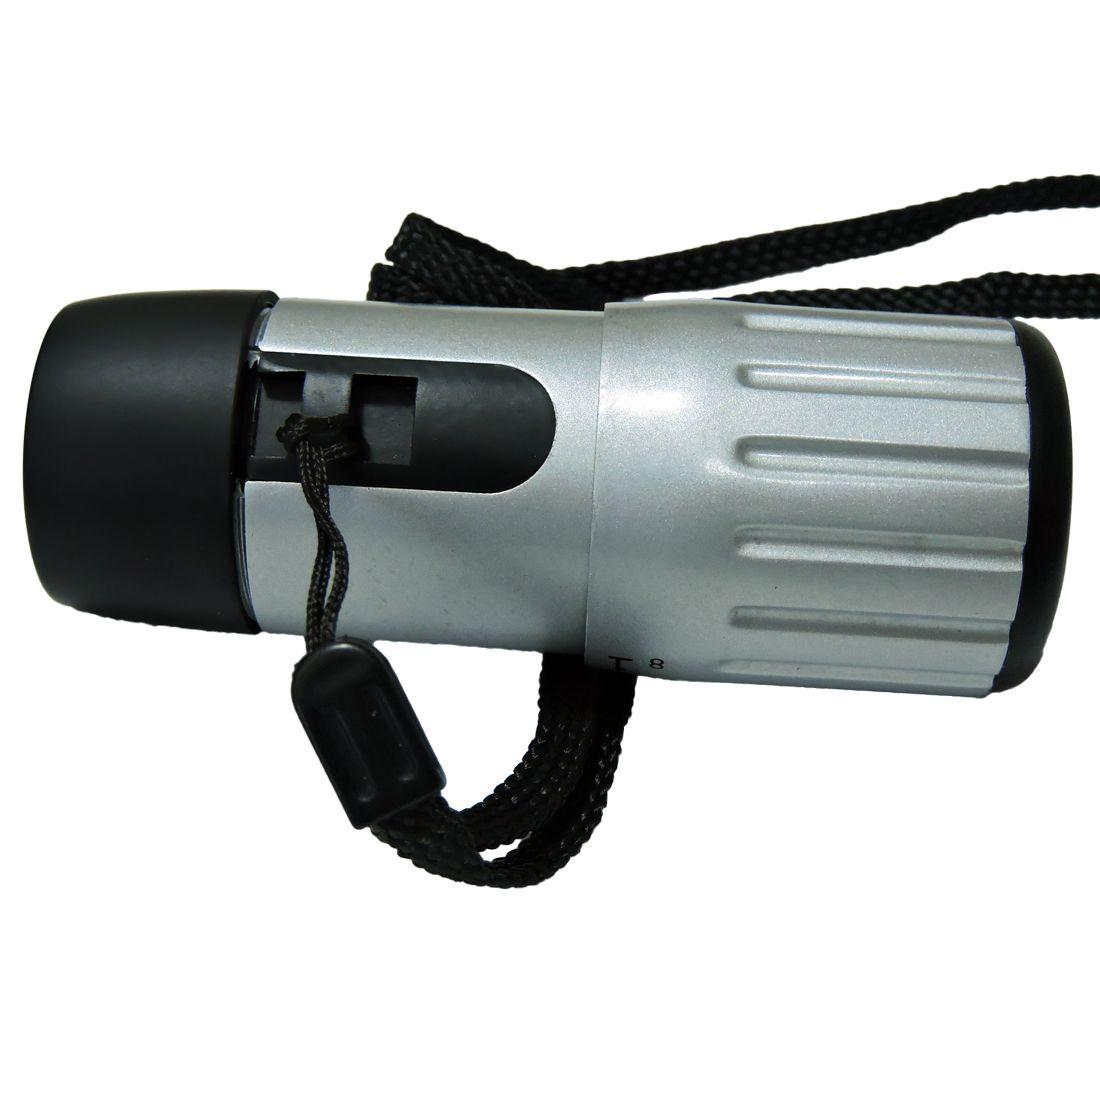 Monóculo Black Bull 6x18 Ultra Compacto